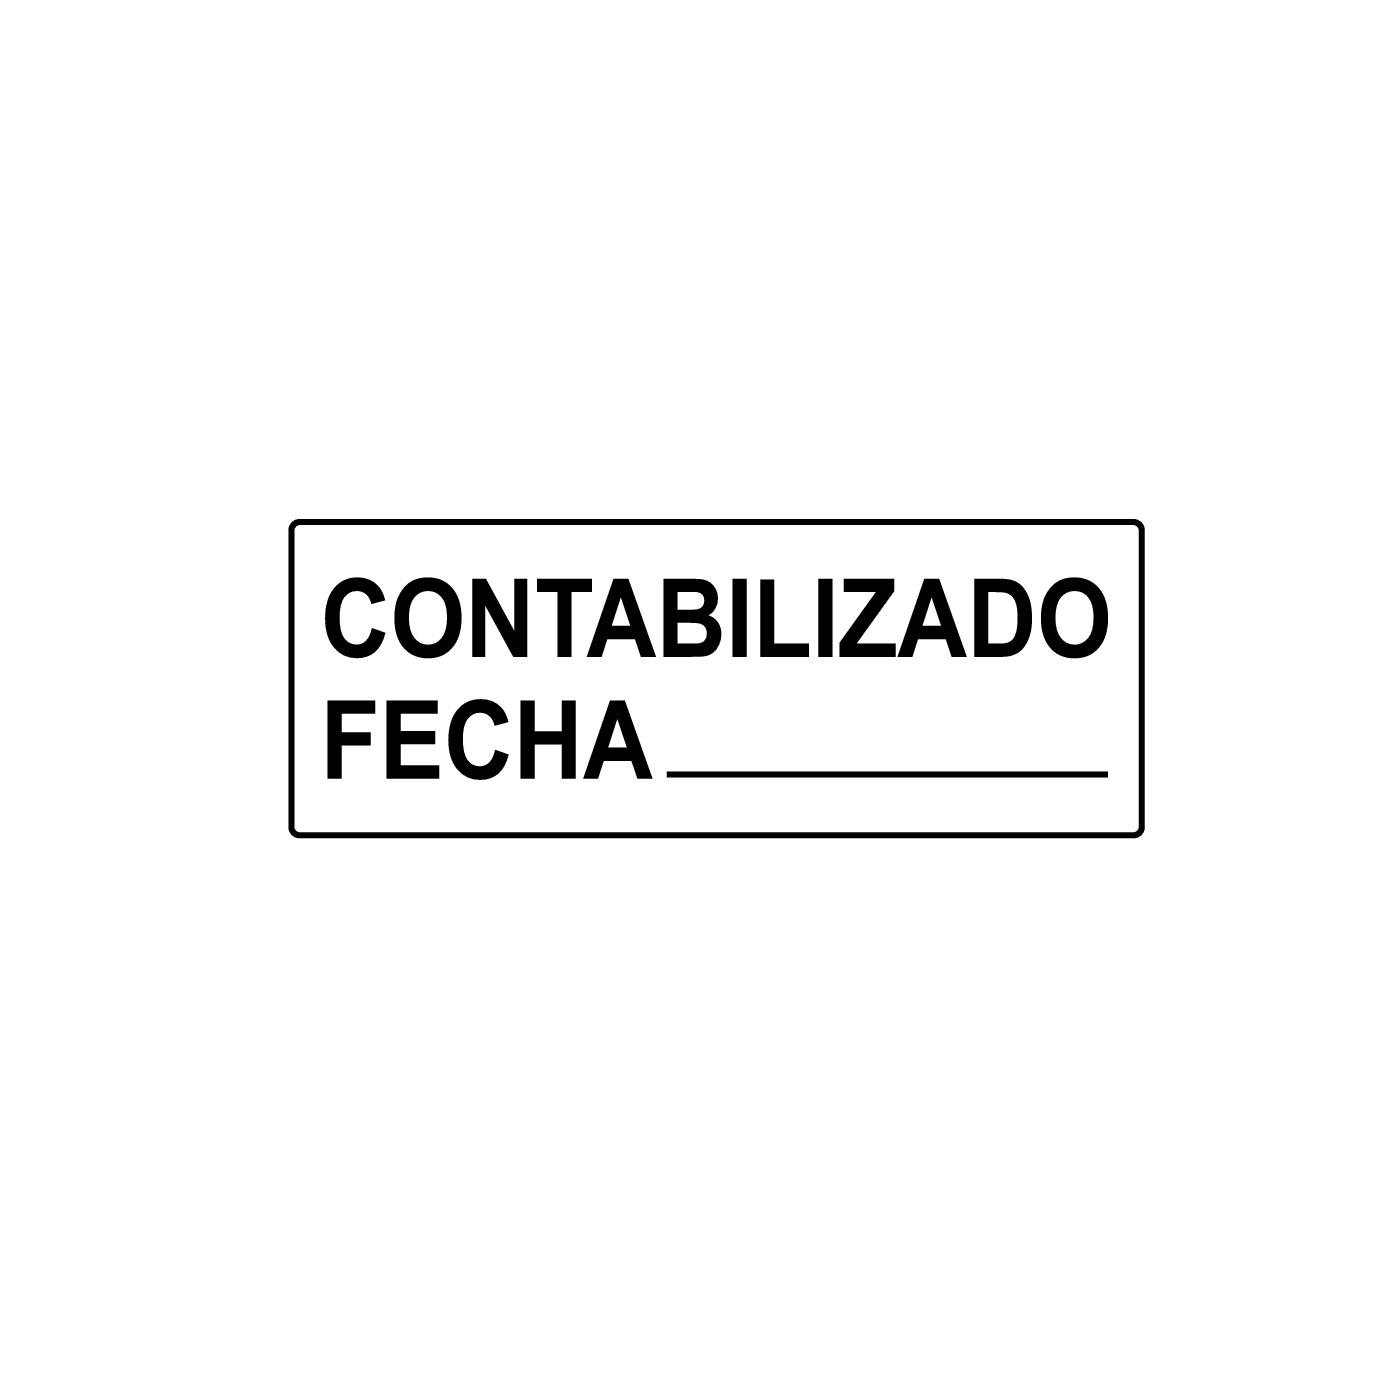 contabilizado-fecha-001